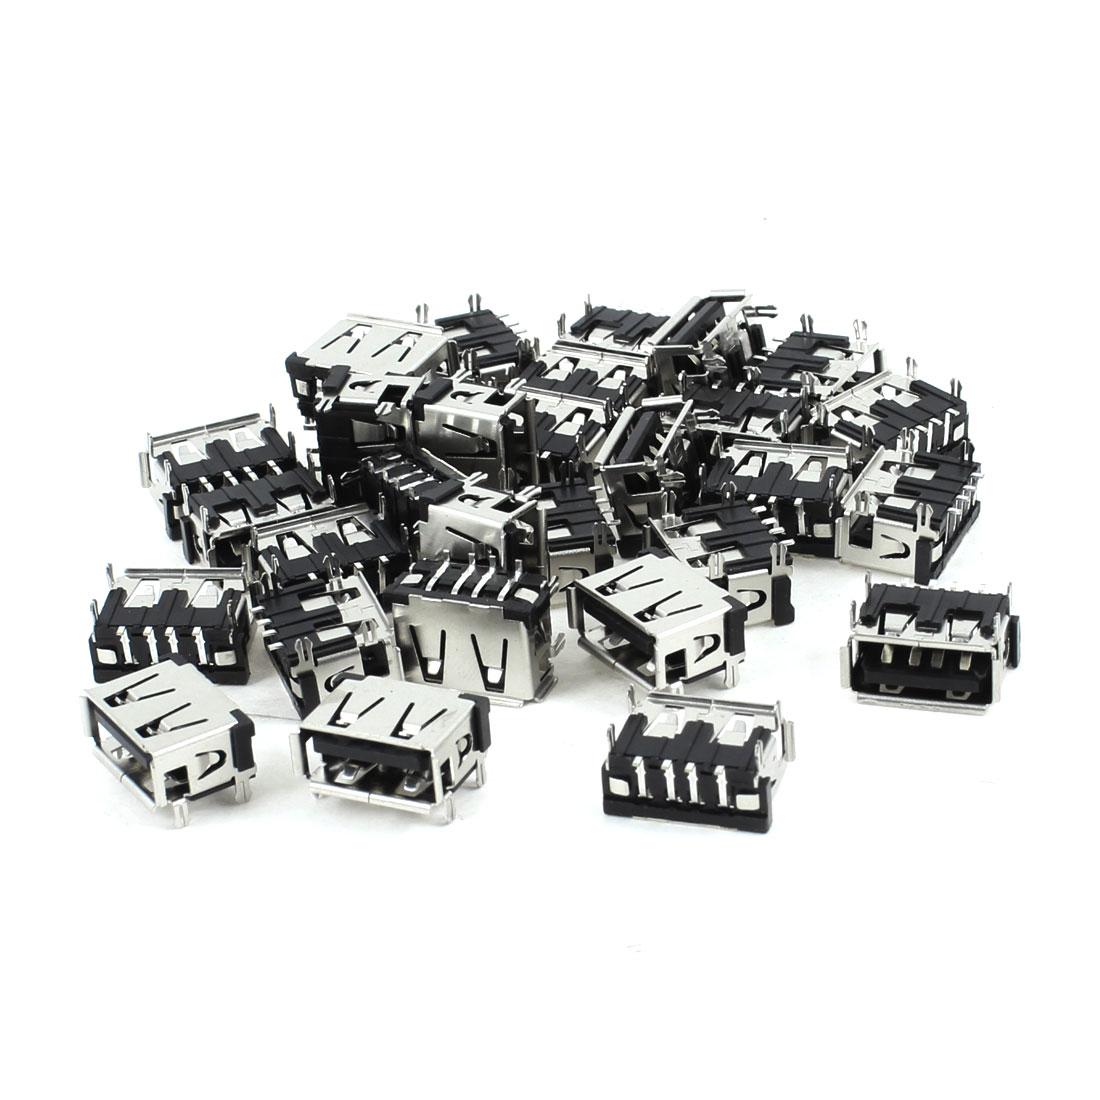 30 Pcs USB Type A 90 Degree 4-Pin SMD Female Jack Socket Port